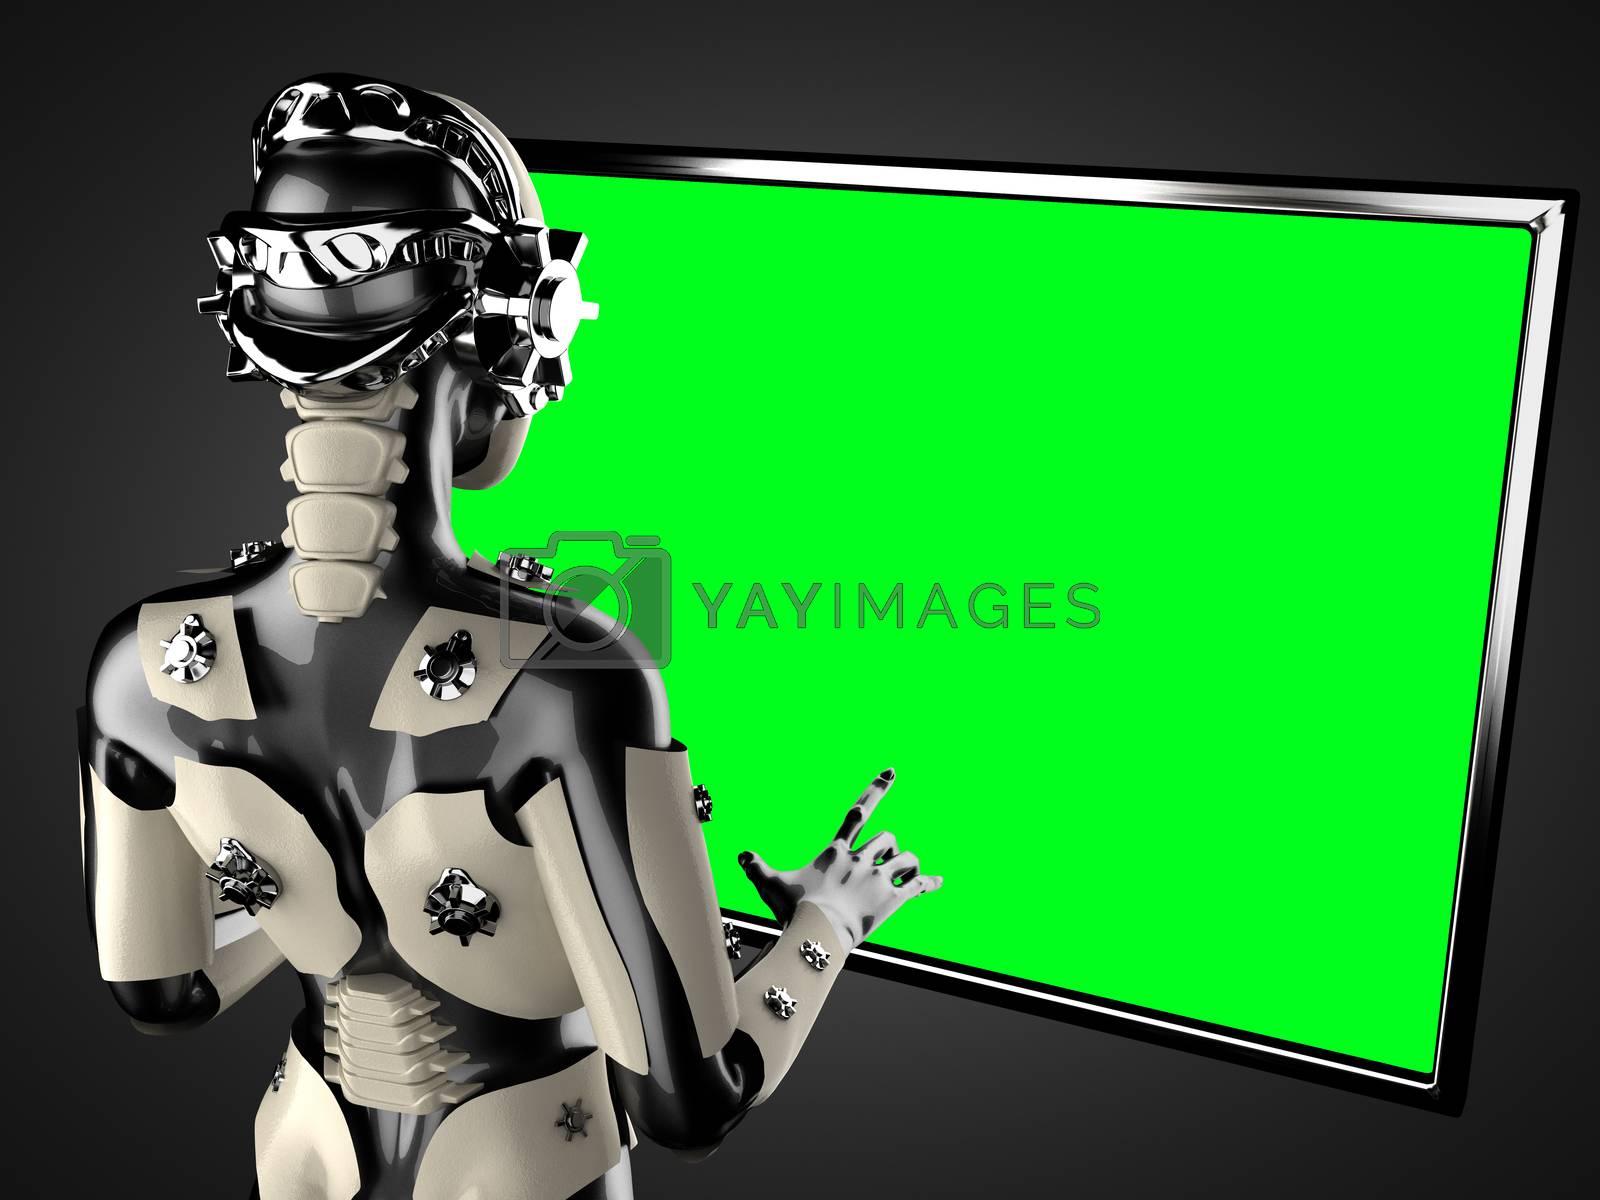 Royalty free image of robot woman manipulating hologram displey by videodoctor